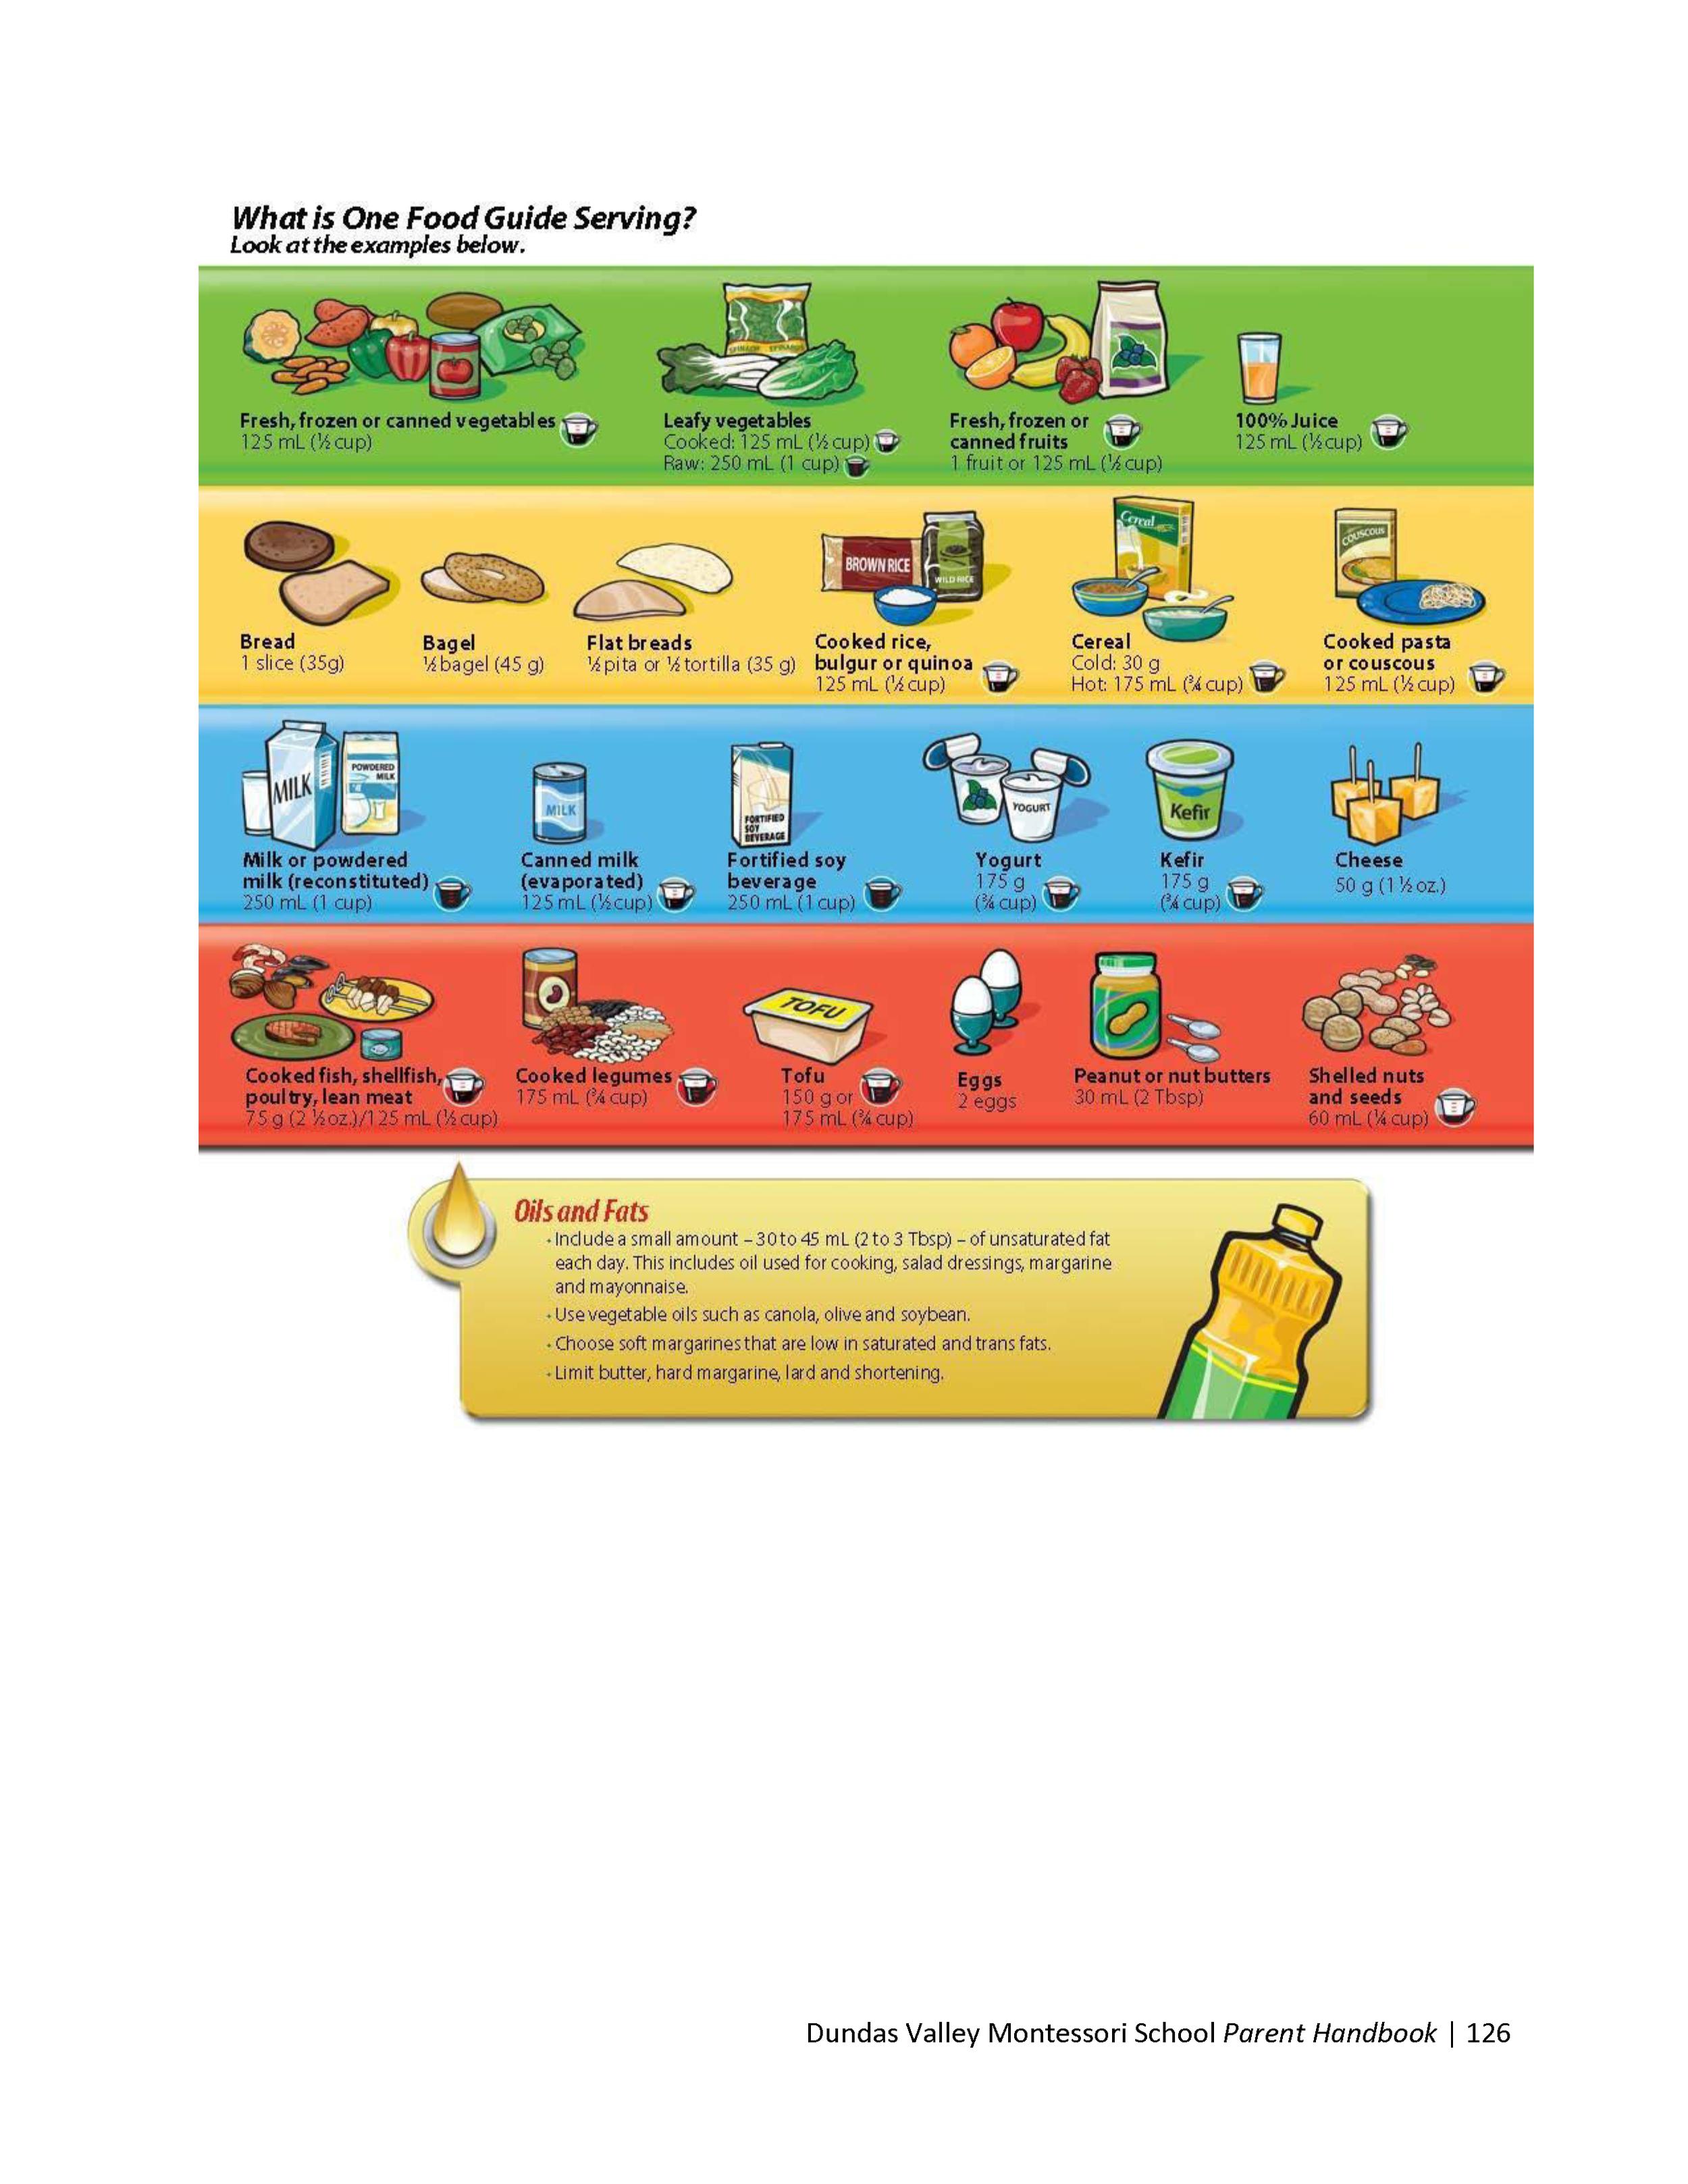 DVMS-Parent-Handbook-19-20_Page_128.png